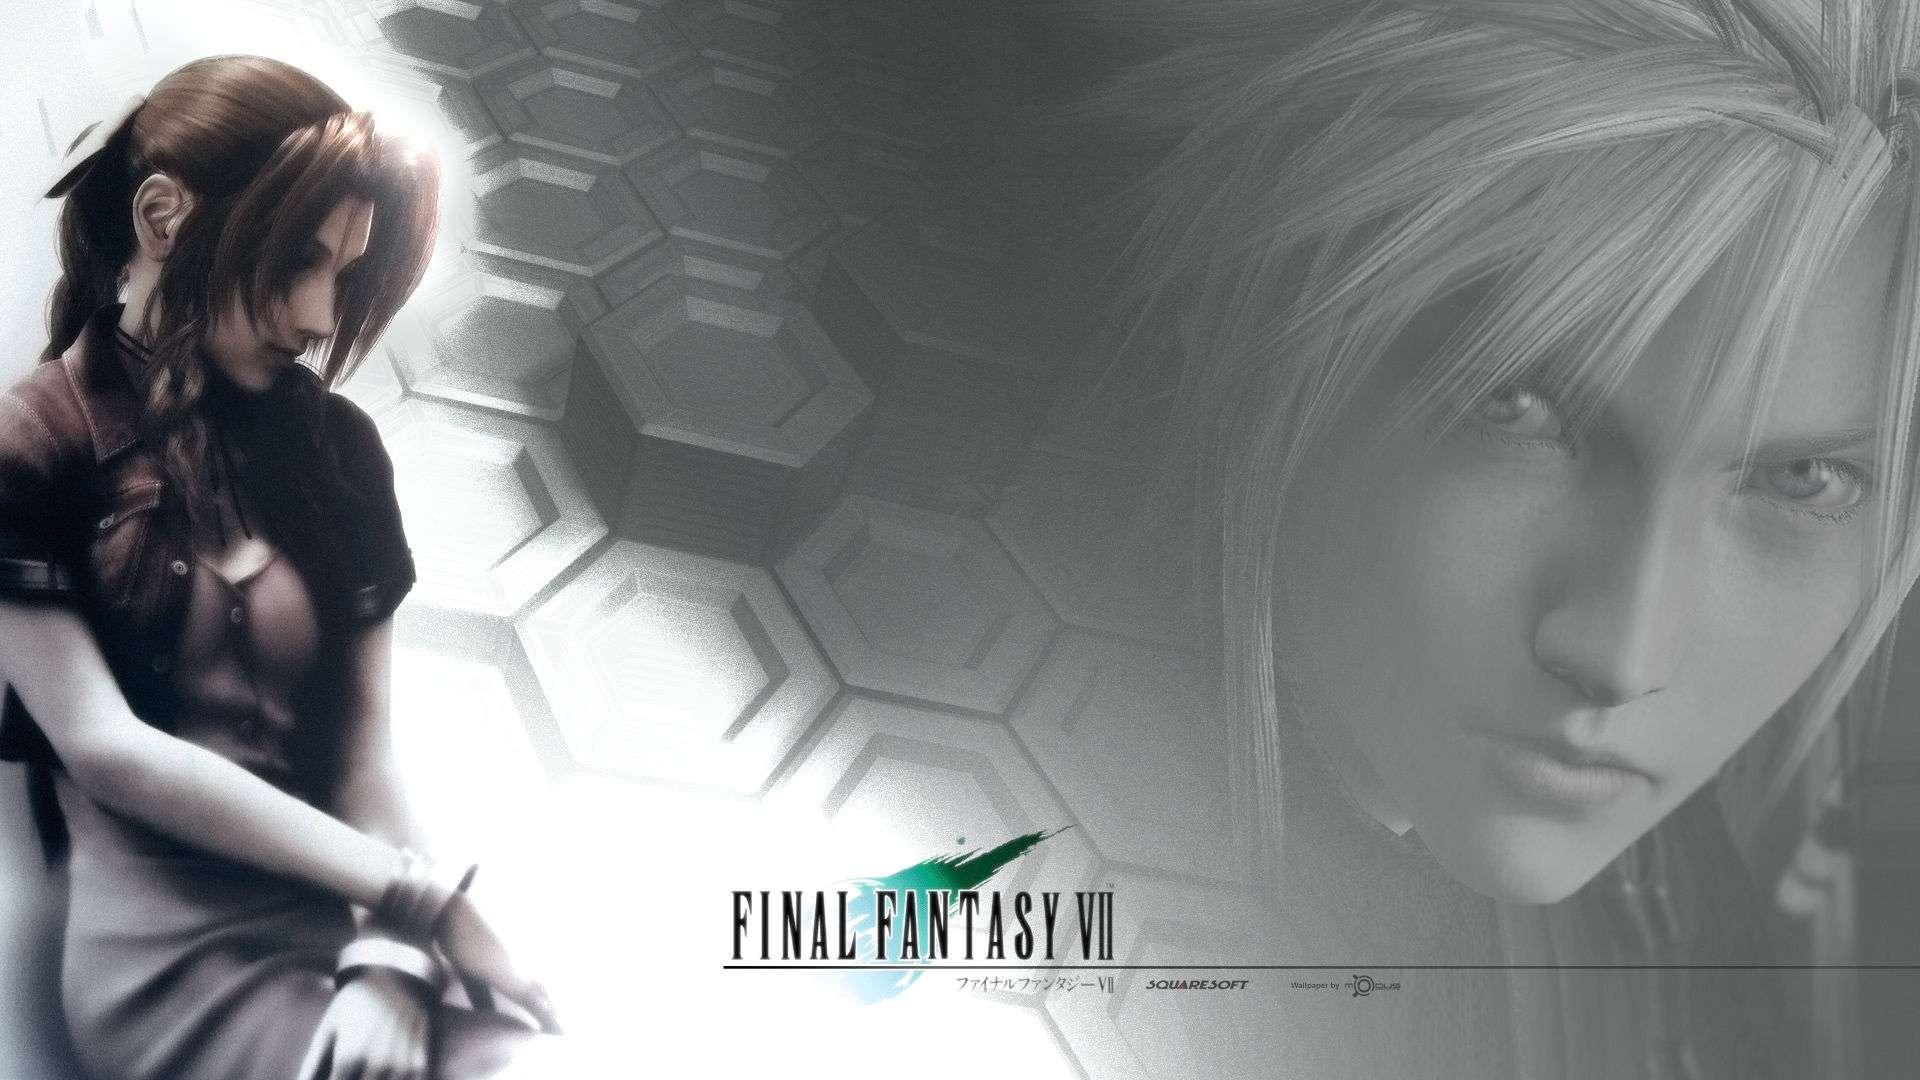 Final Fantasy Video Game Wallpaper 018